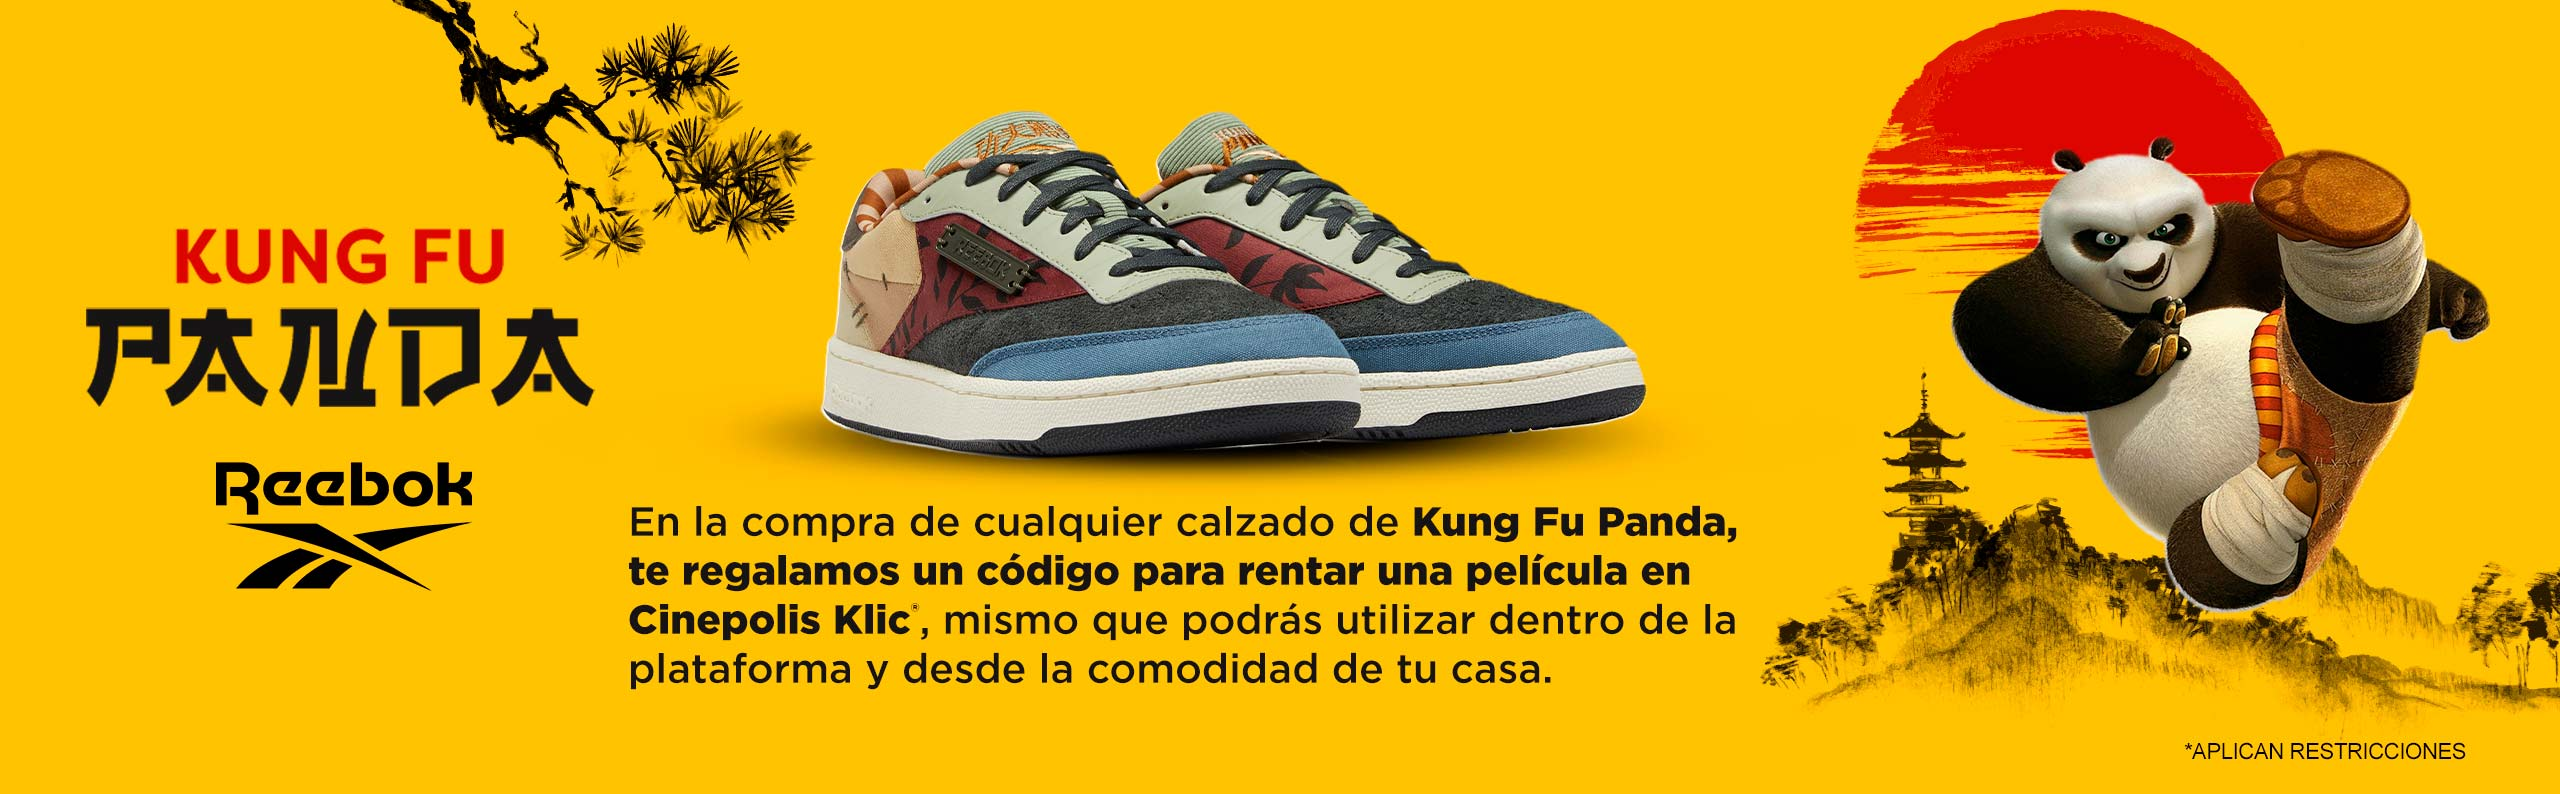 KUNG FU PANDA CINEPOLIS KLIC